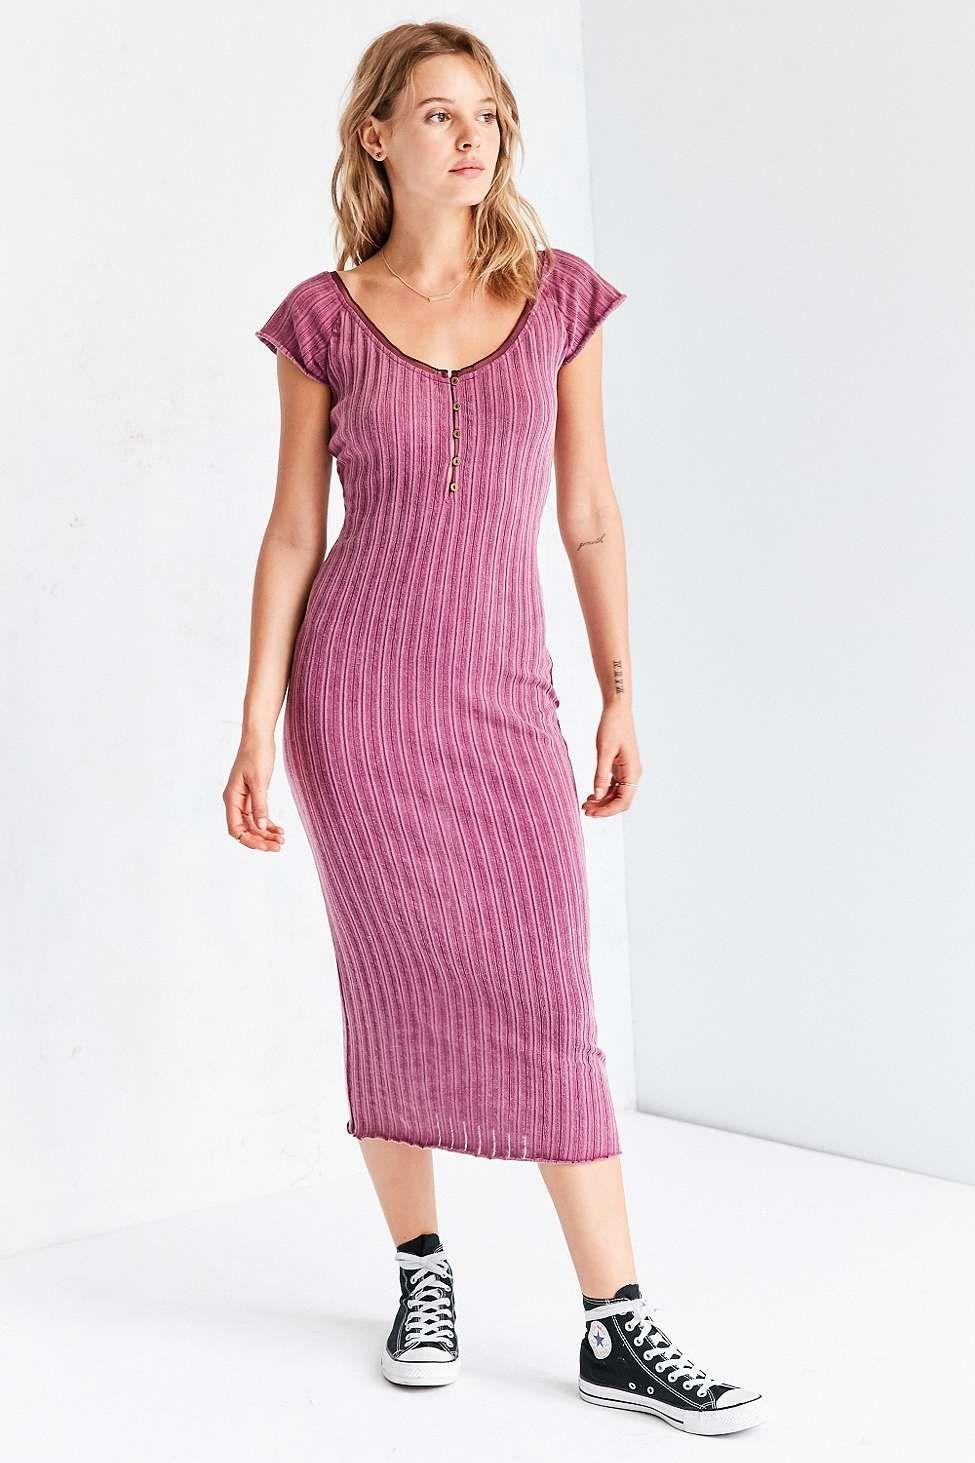 Pink n purple dress  Ecote Grungy Maroon Pointelle Bodycon Midi Dress  Midi dresses